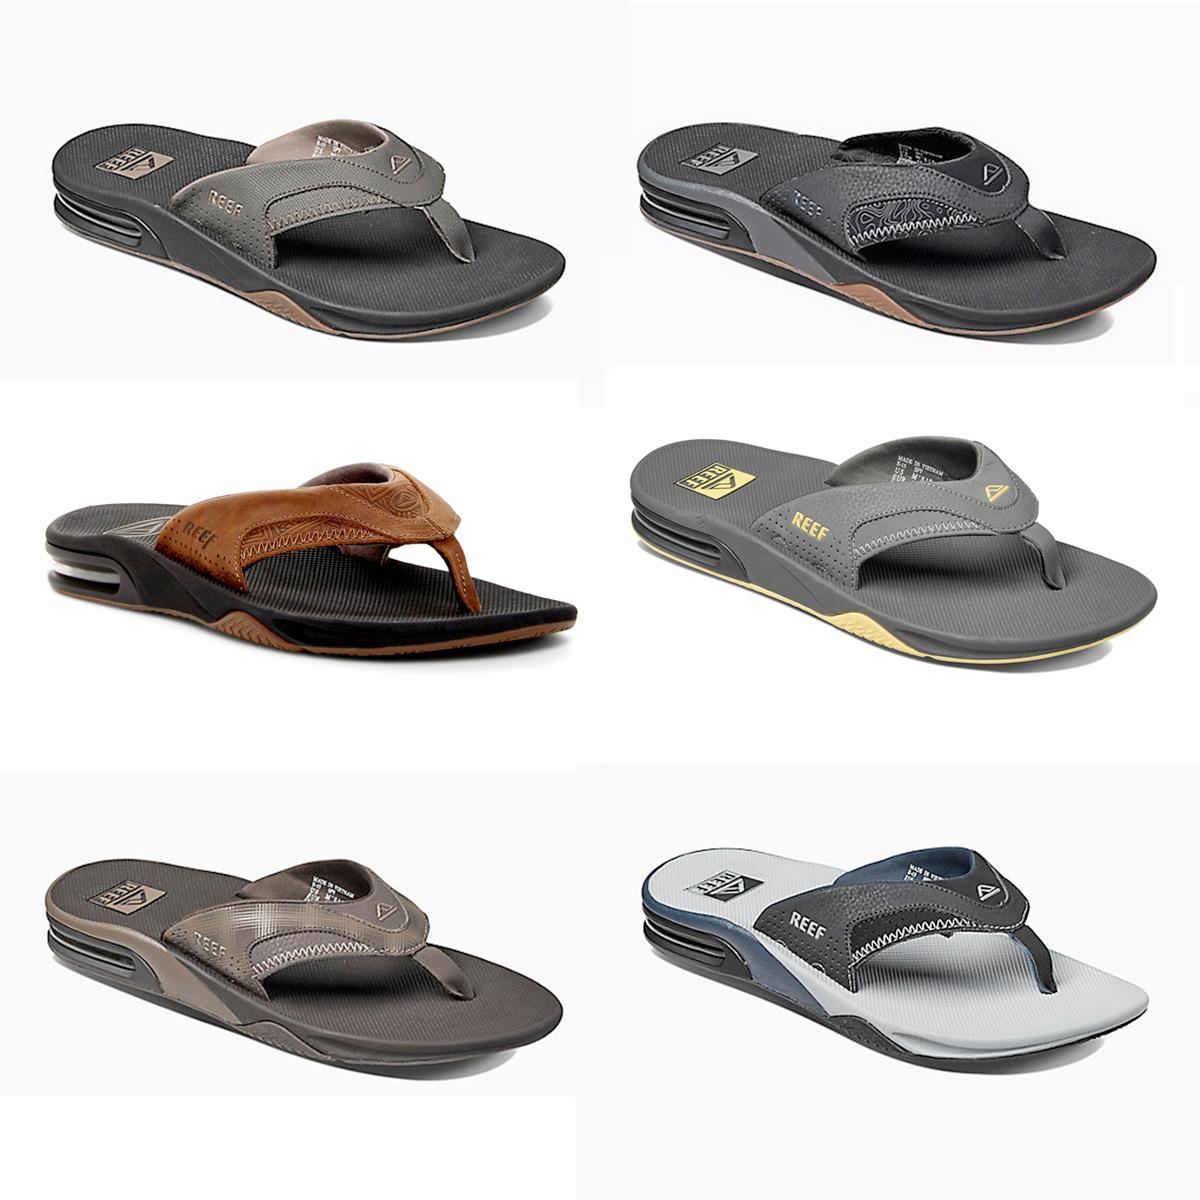 306162eb40f Details about Reef Sandal - Fanning Flip Flops - Mick Fanning Pro Model